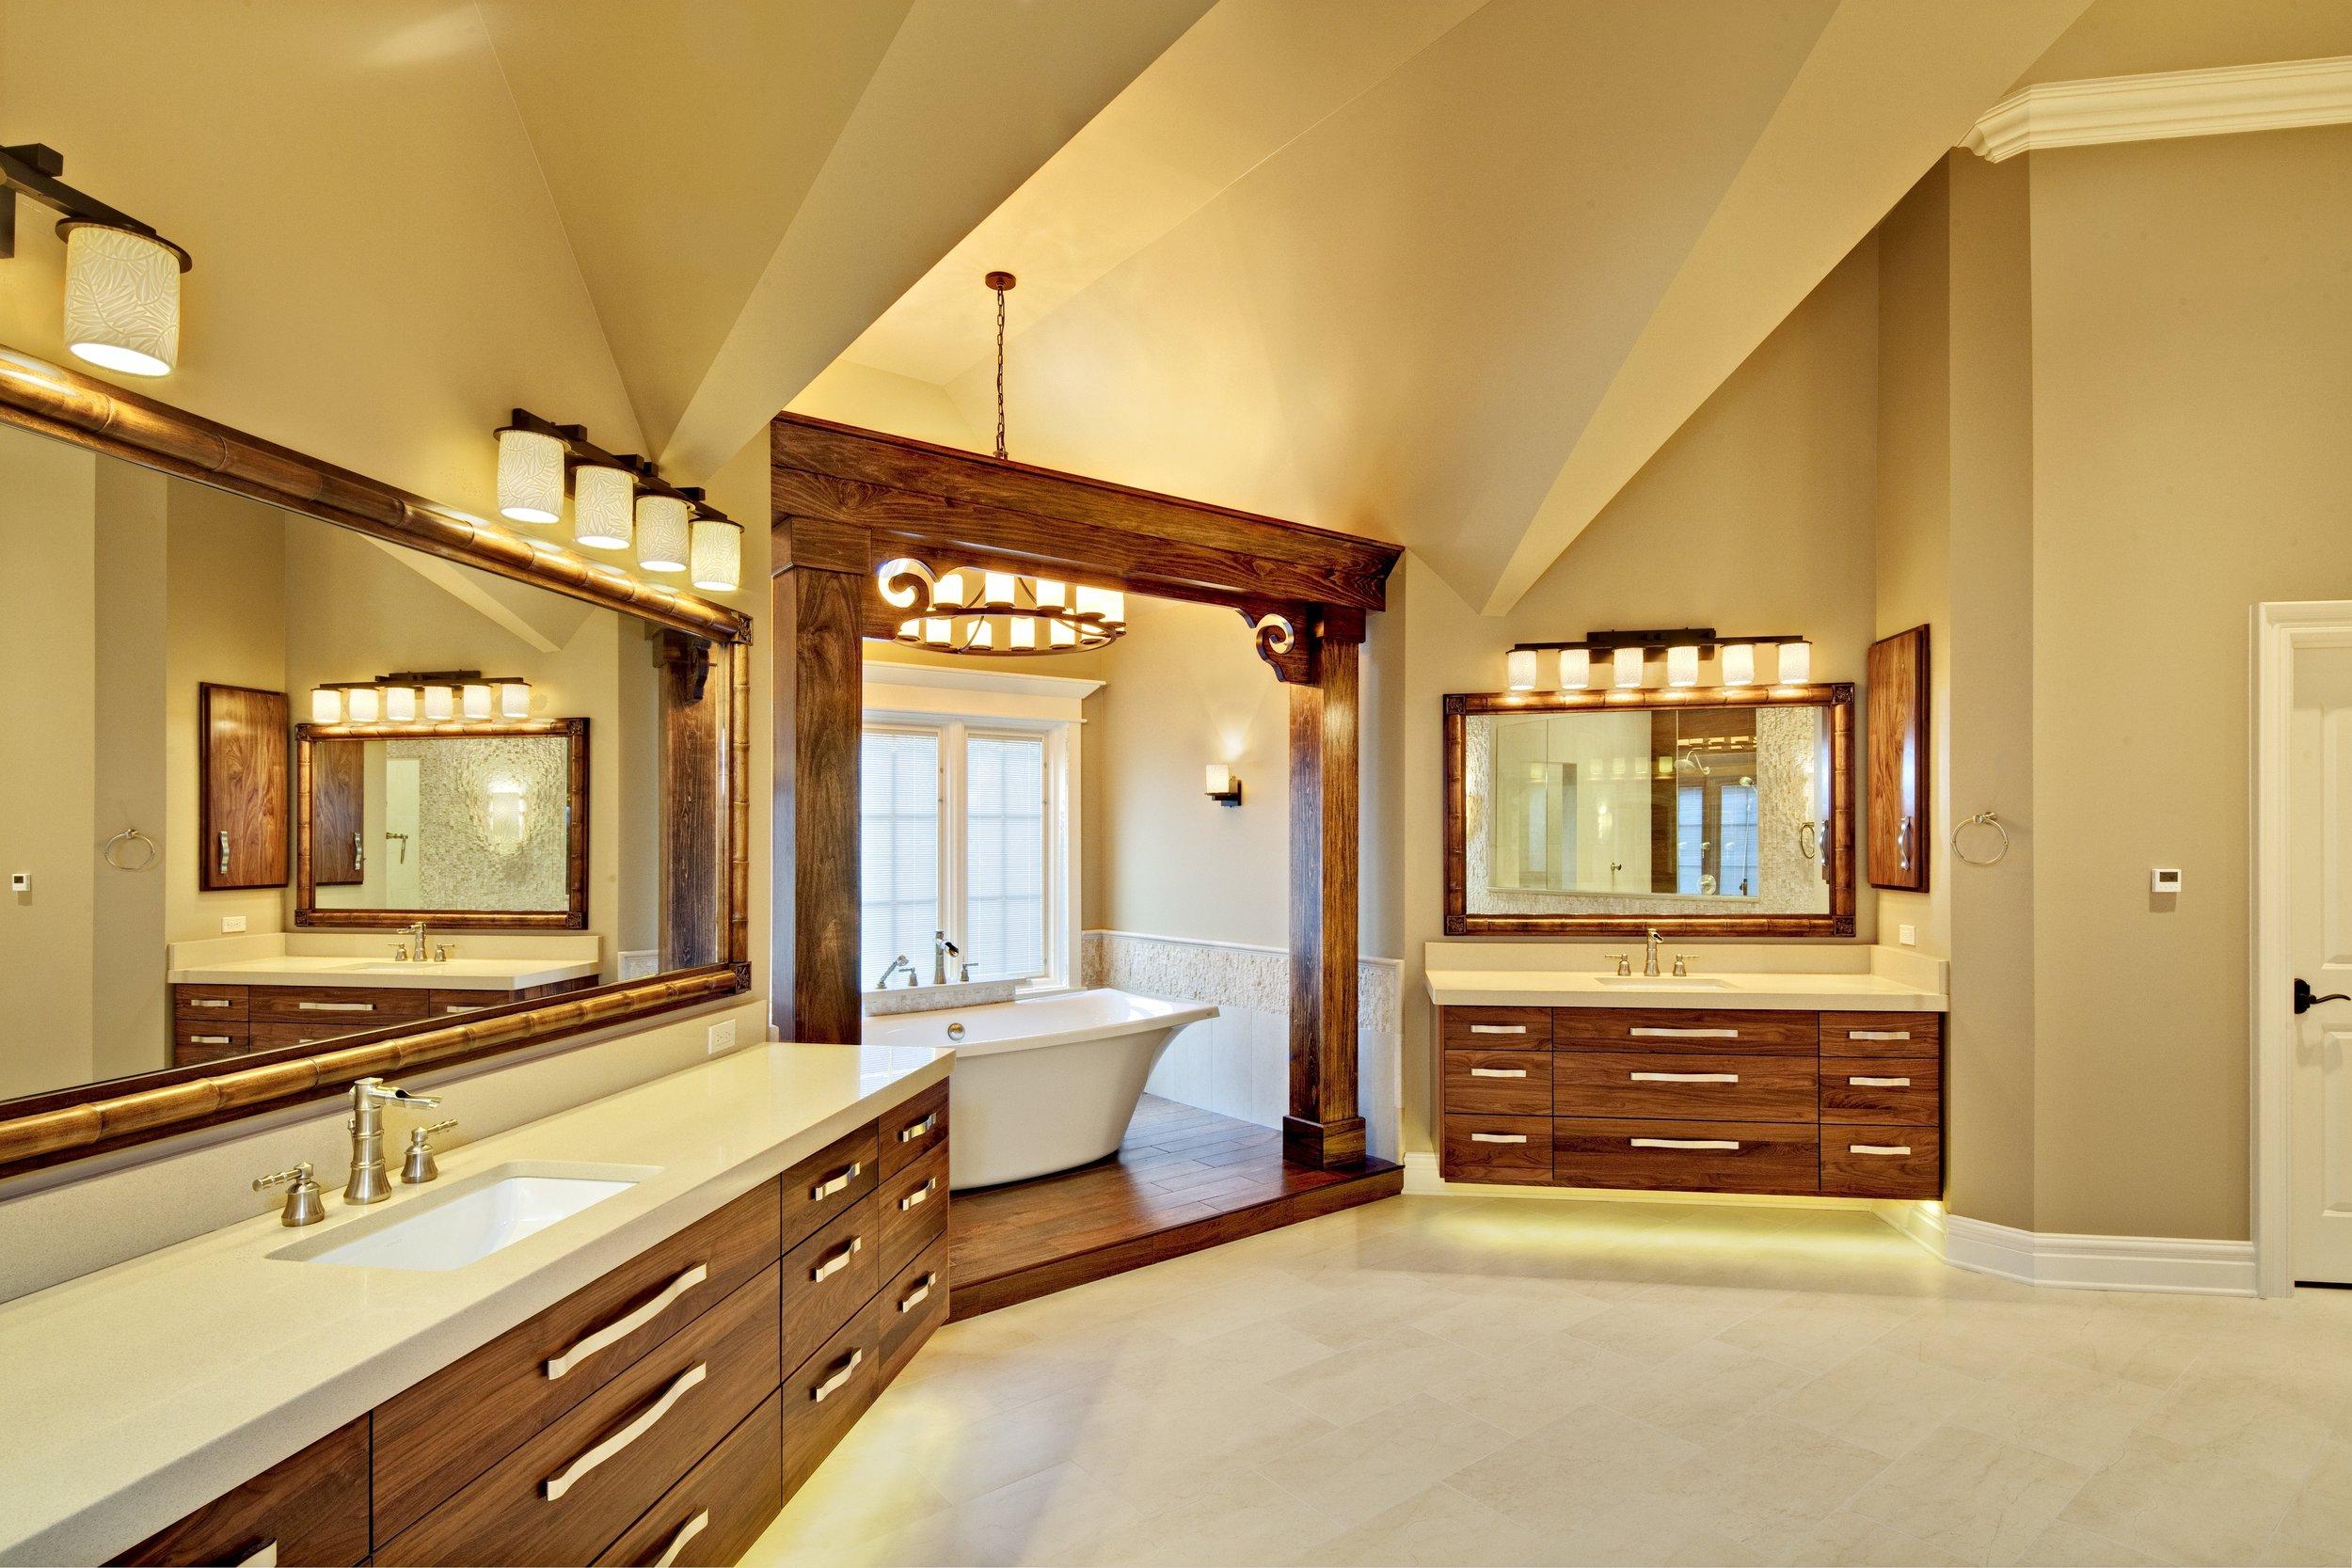 Geneva Illinois Custom Bathroom Remodeling 60134- Southampton Builders LLC.